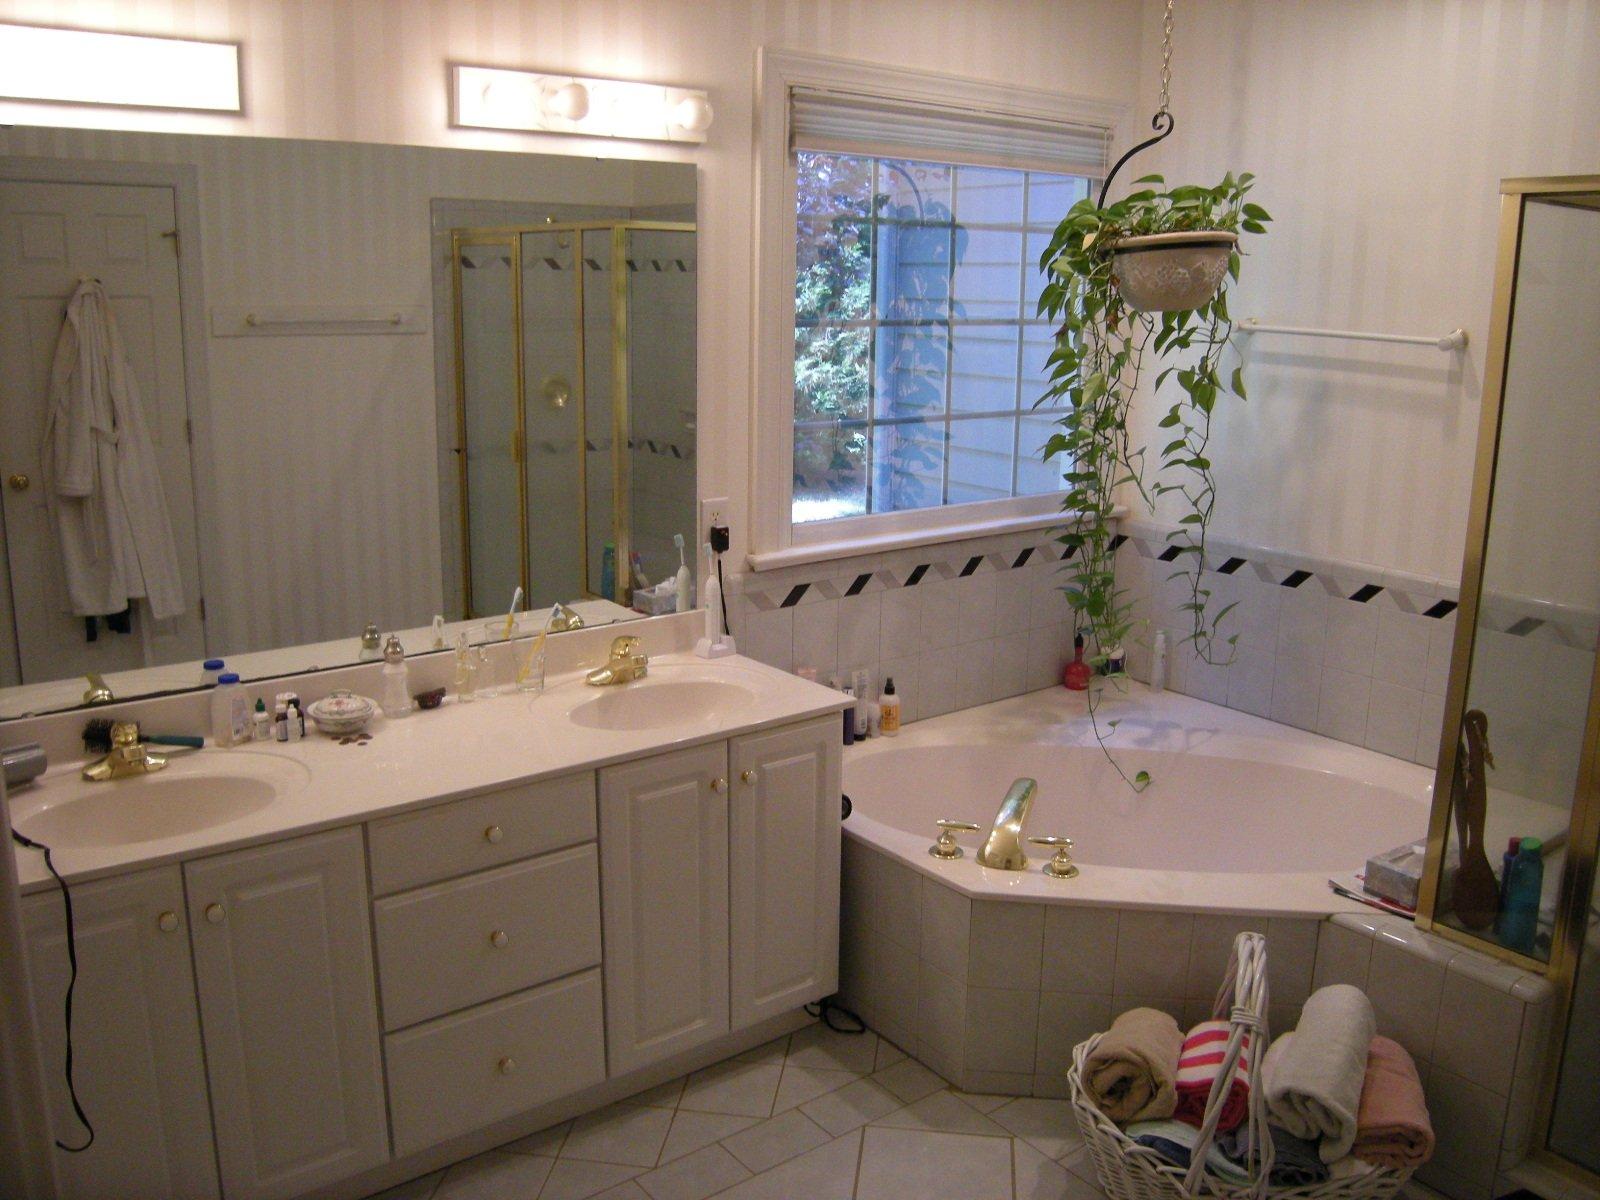 Doorless Bathroom With Large Bathtub